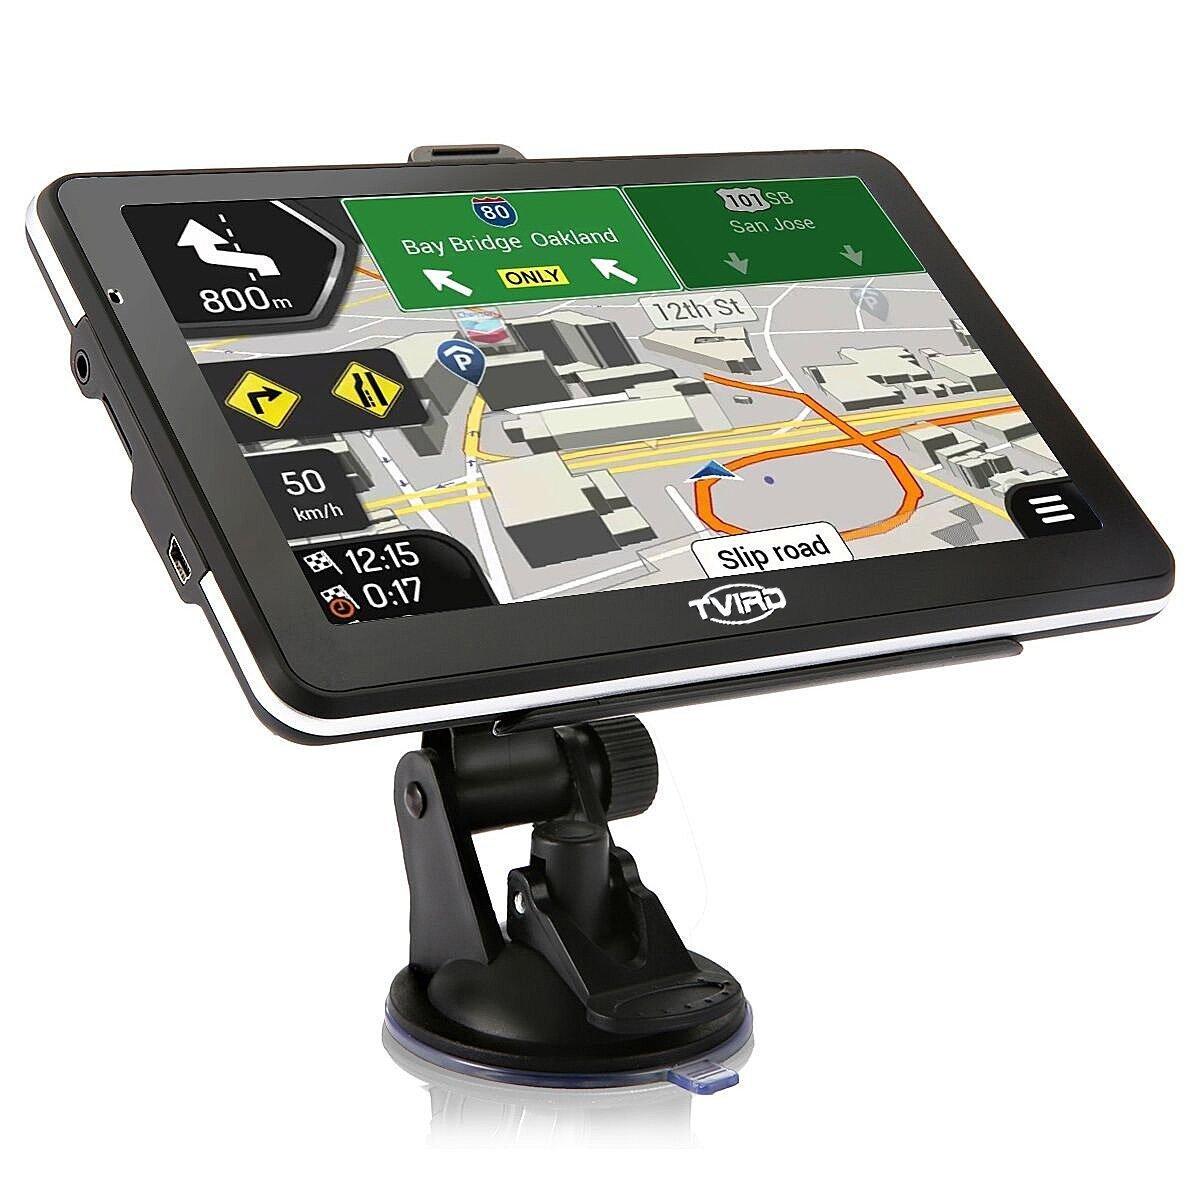 Tvird 車載GPSナビゲーションシステム 7インチ HD 音声プロンプト USBケーブルと車用充電器付き 拡張32GBメモリ 生涯地図アップデート無料 B077D1XK3C